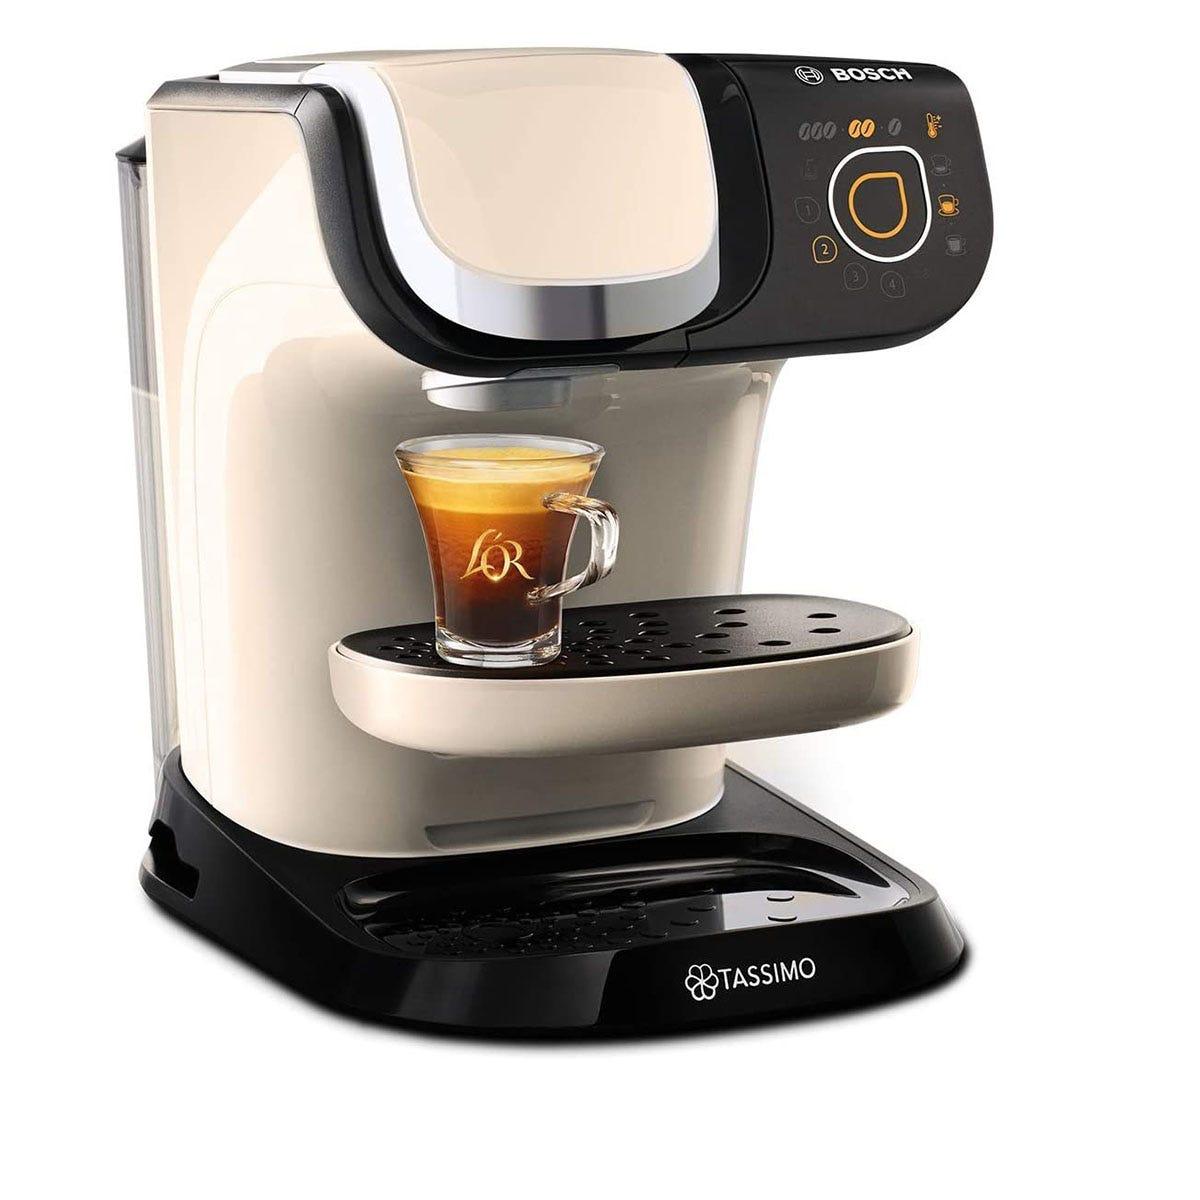 Tassimo by Bosch TAS6507GB My Way 2 Pod Coffee Machine - Cream